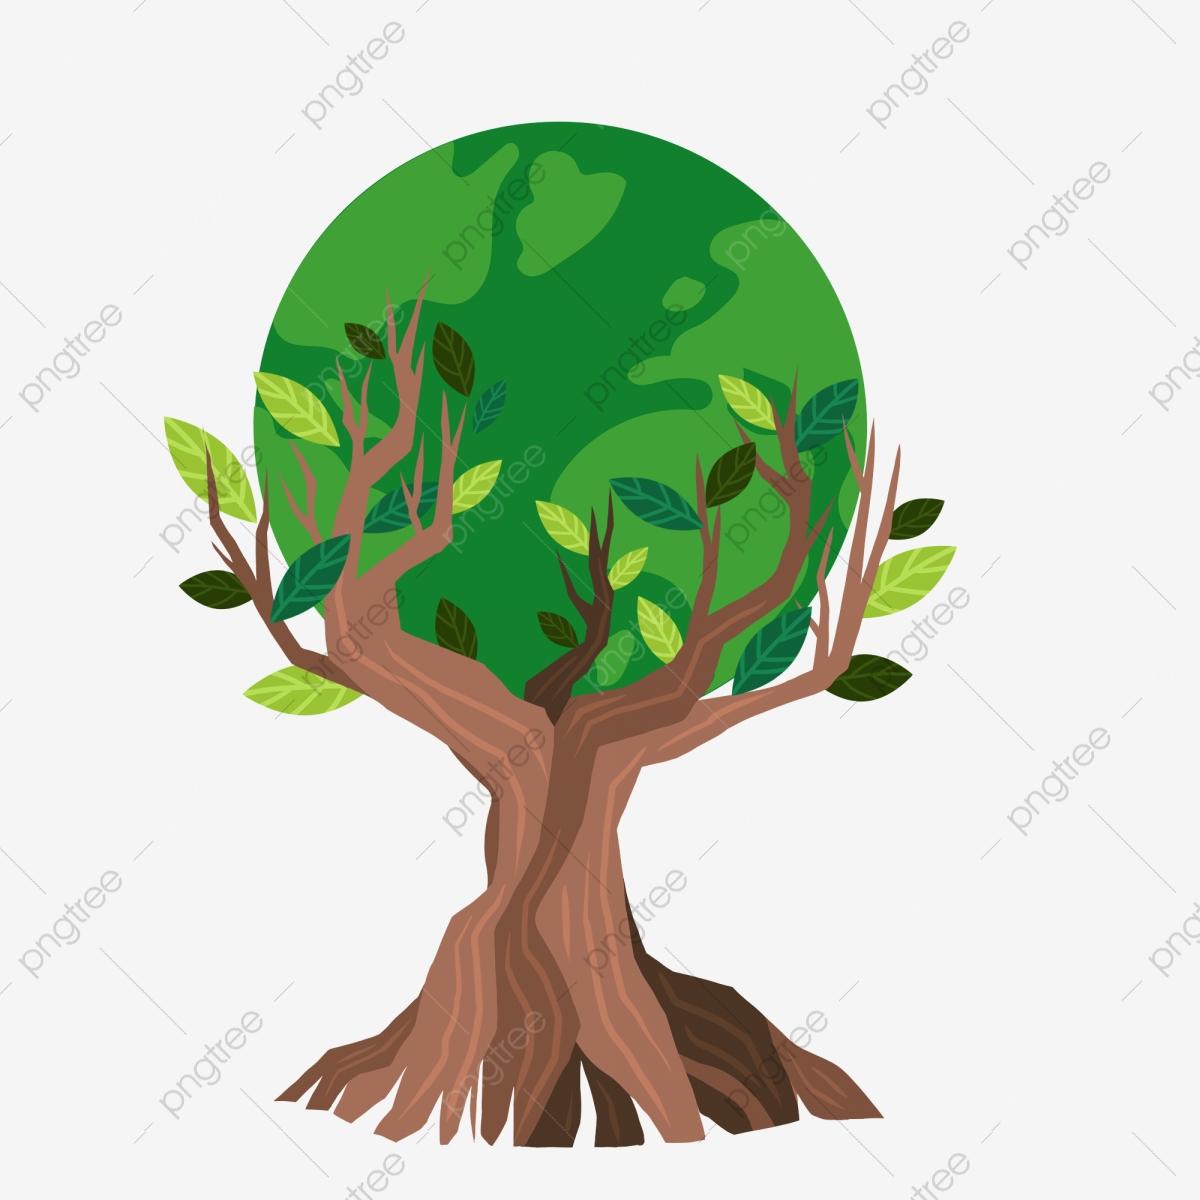 Trees green protection illustration. Environment clipart short tree